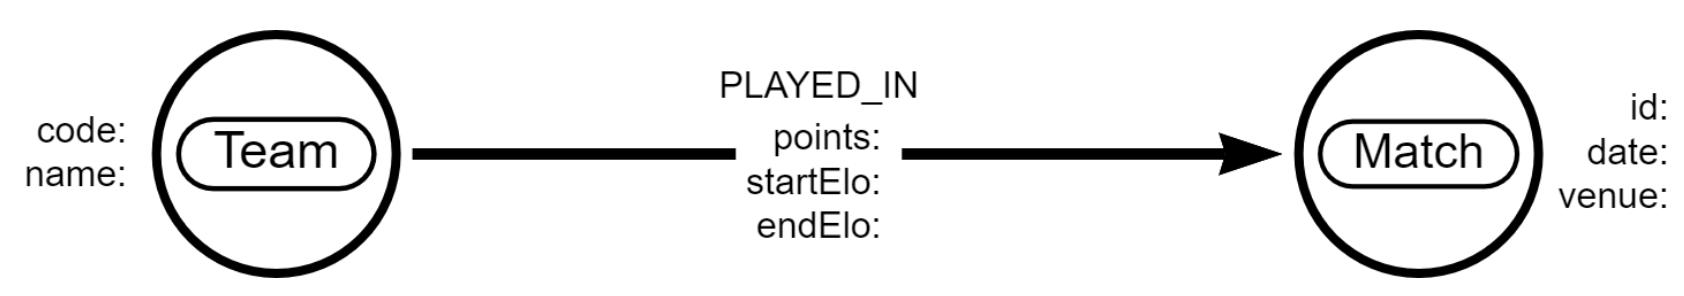 NBAModel